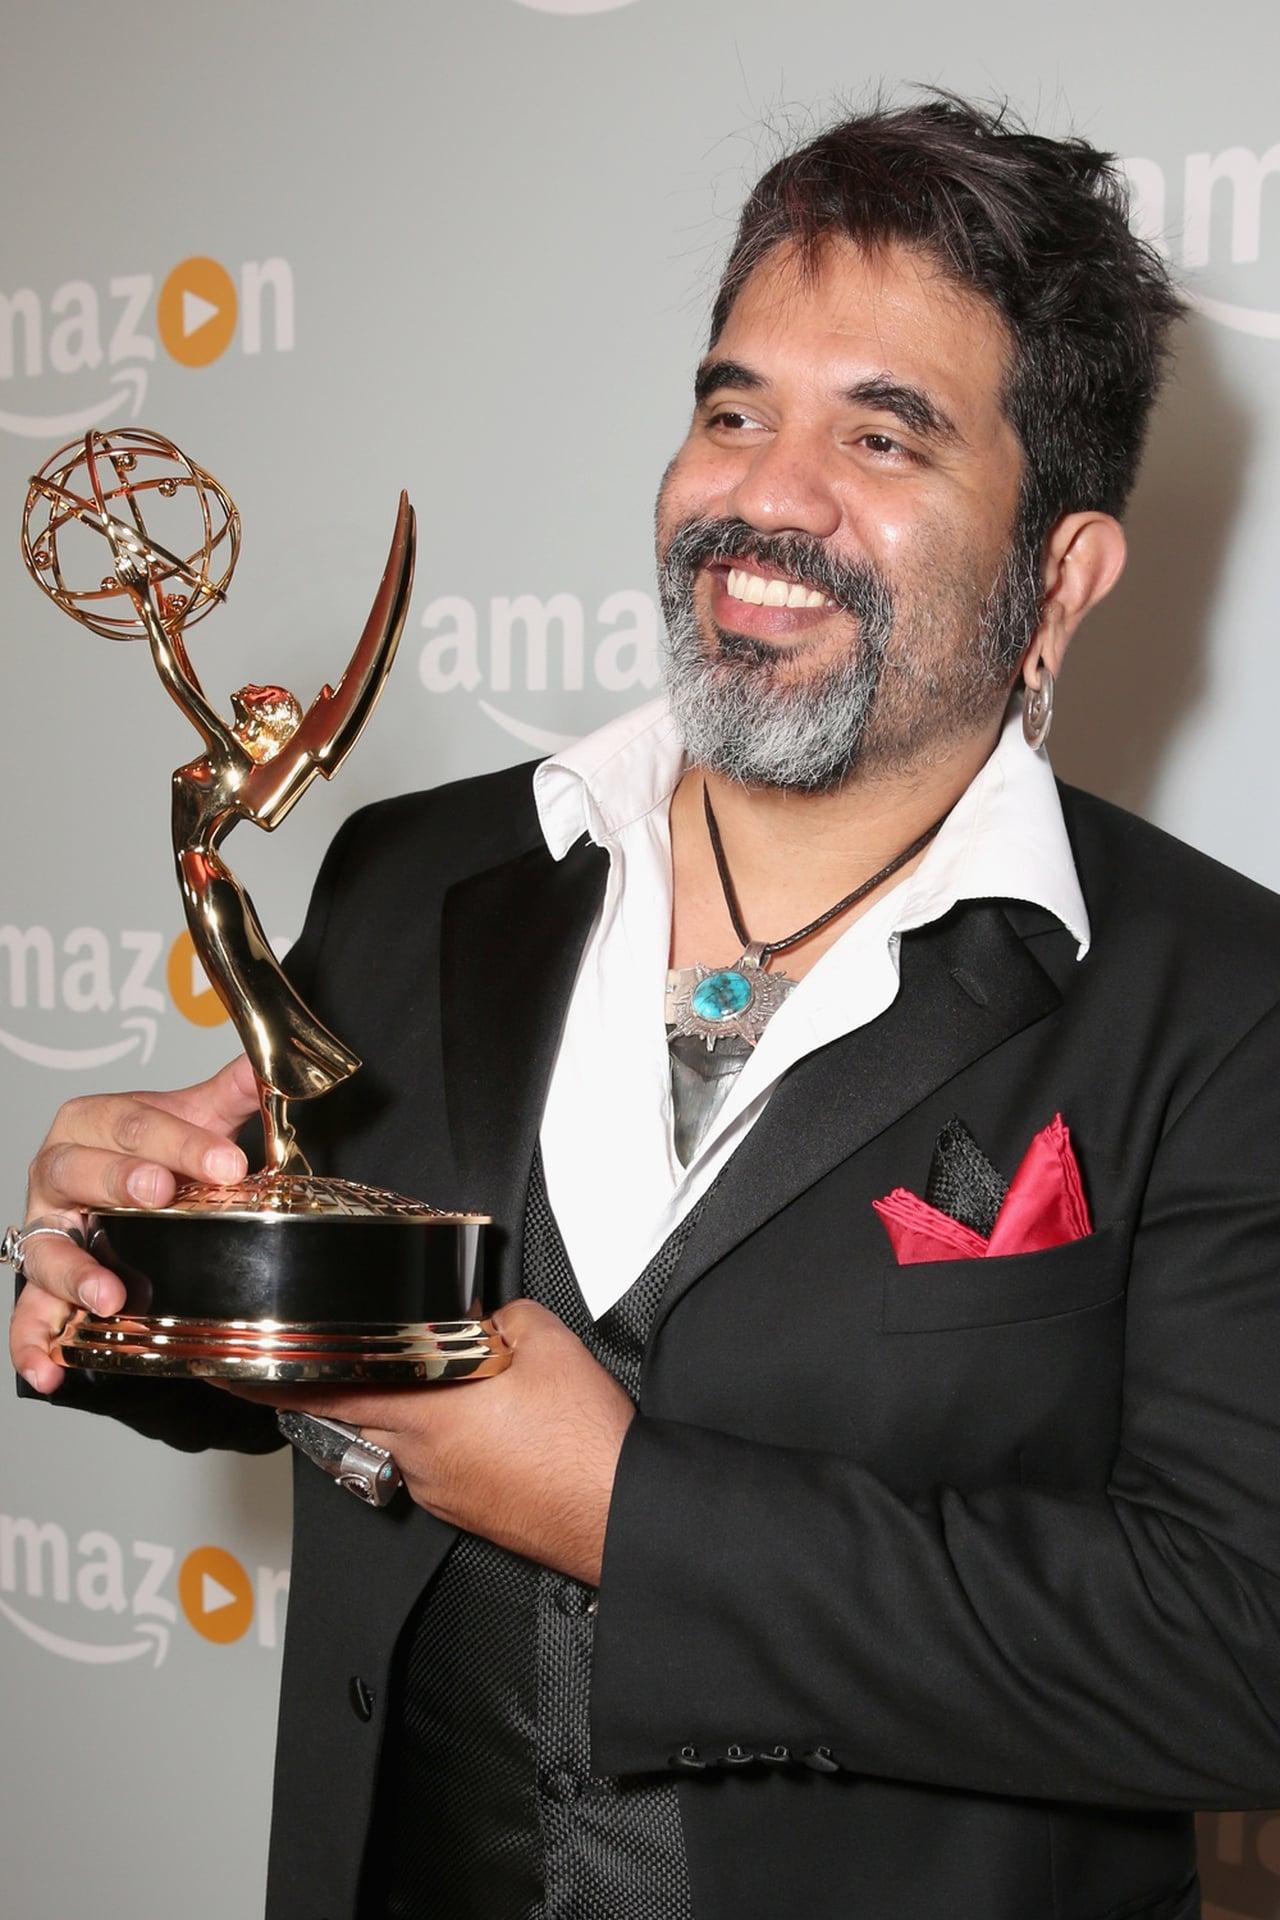 Chris Navarro